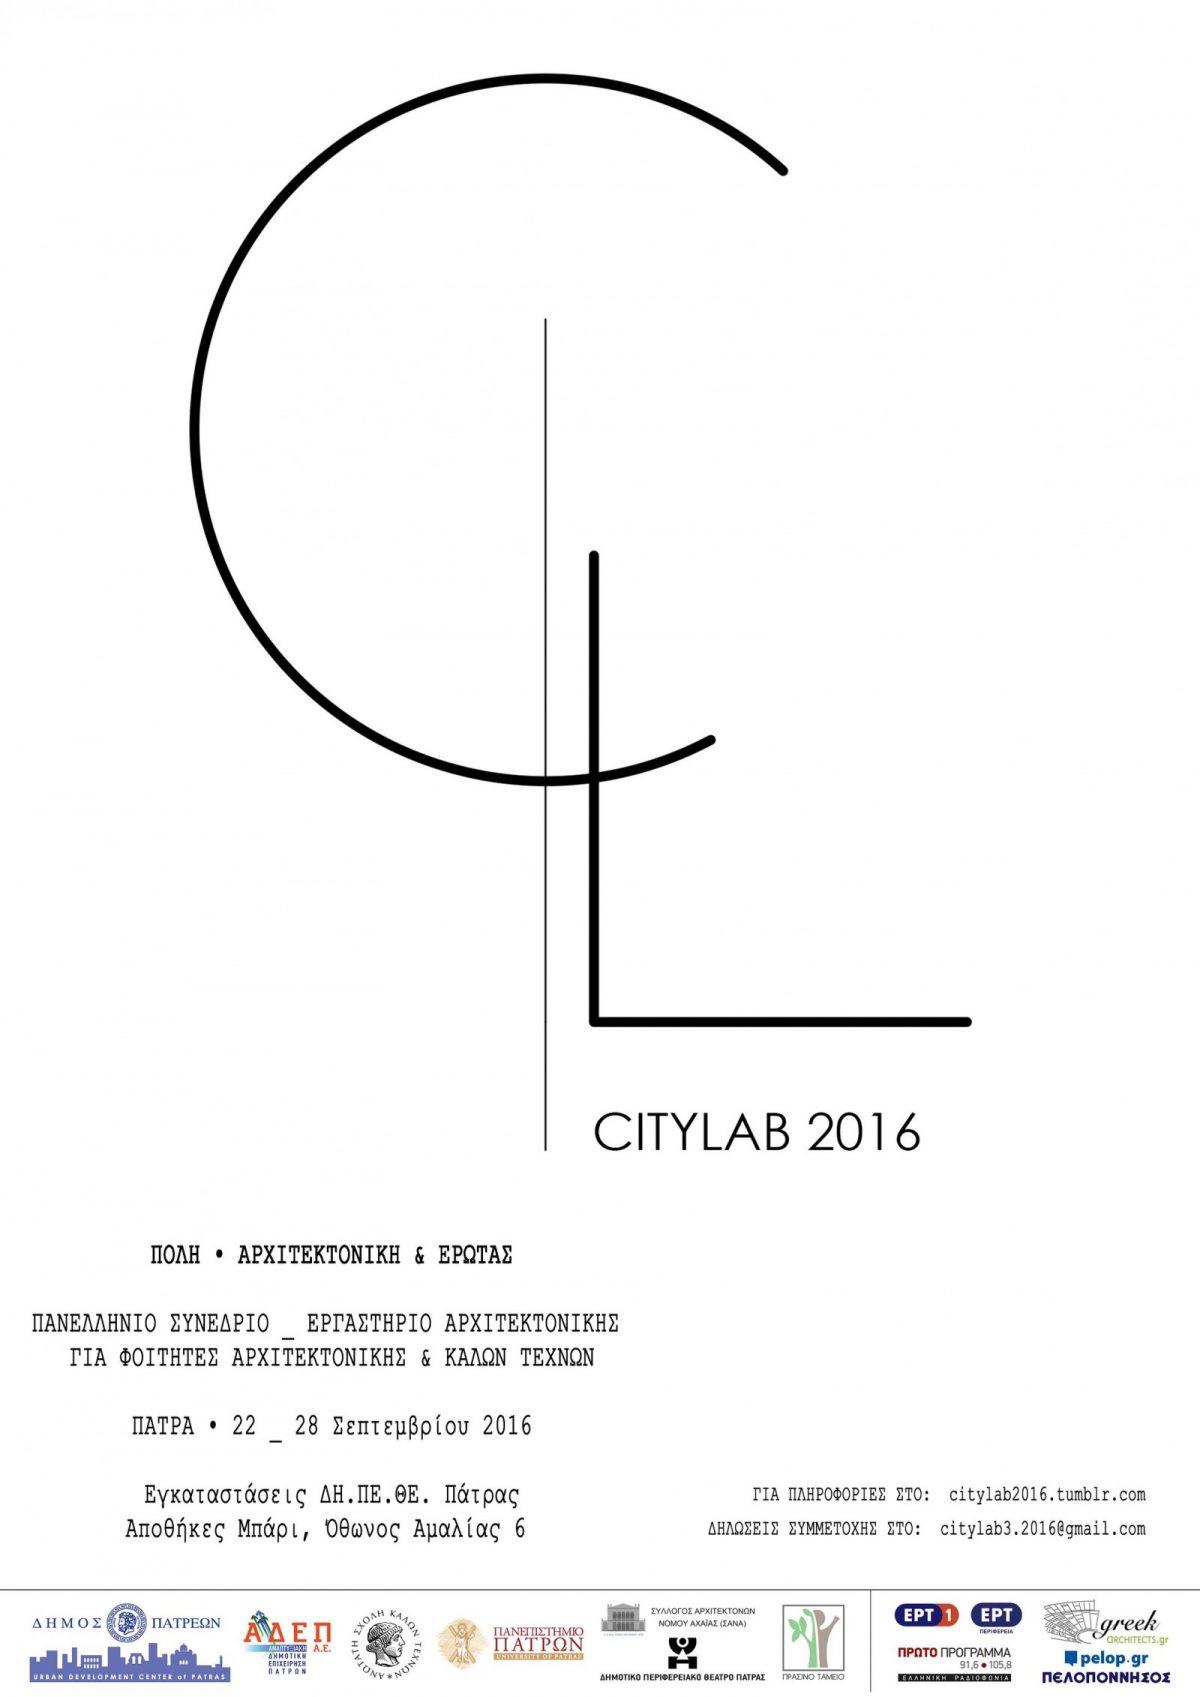 Citylab 2016: Πόλη – Αρχιτεκτονική – Έρωτας / Πάτρα, 22-28 Σεπτεμβρίου 2016